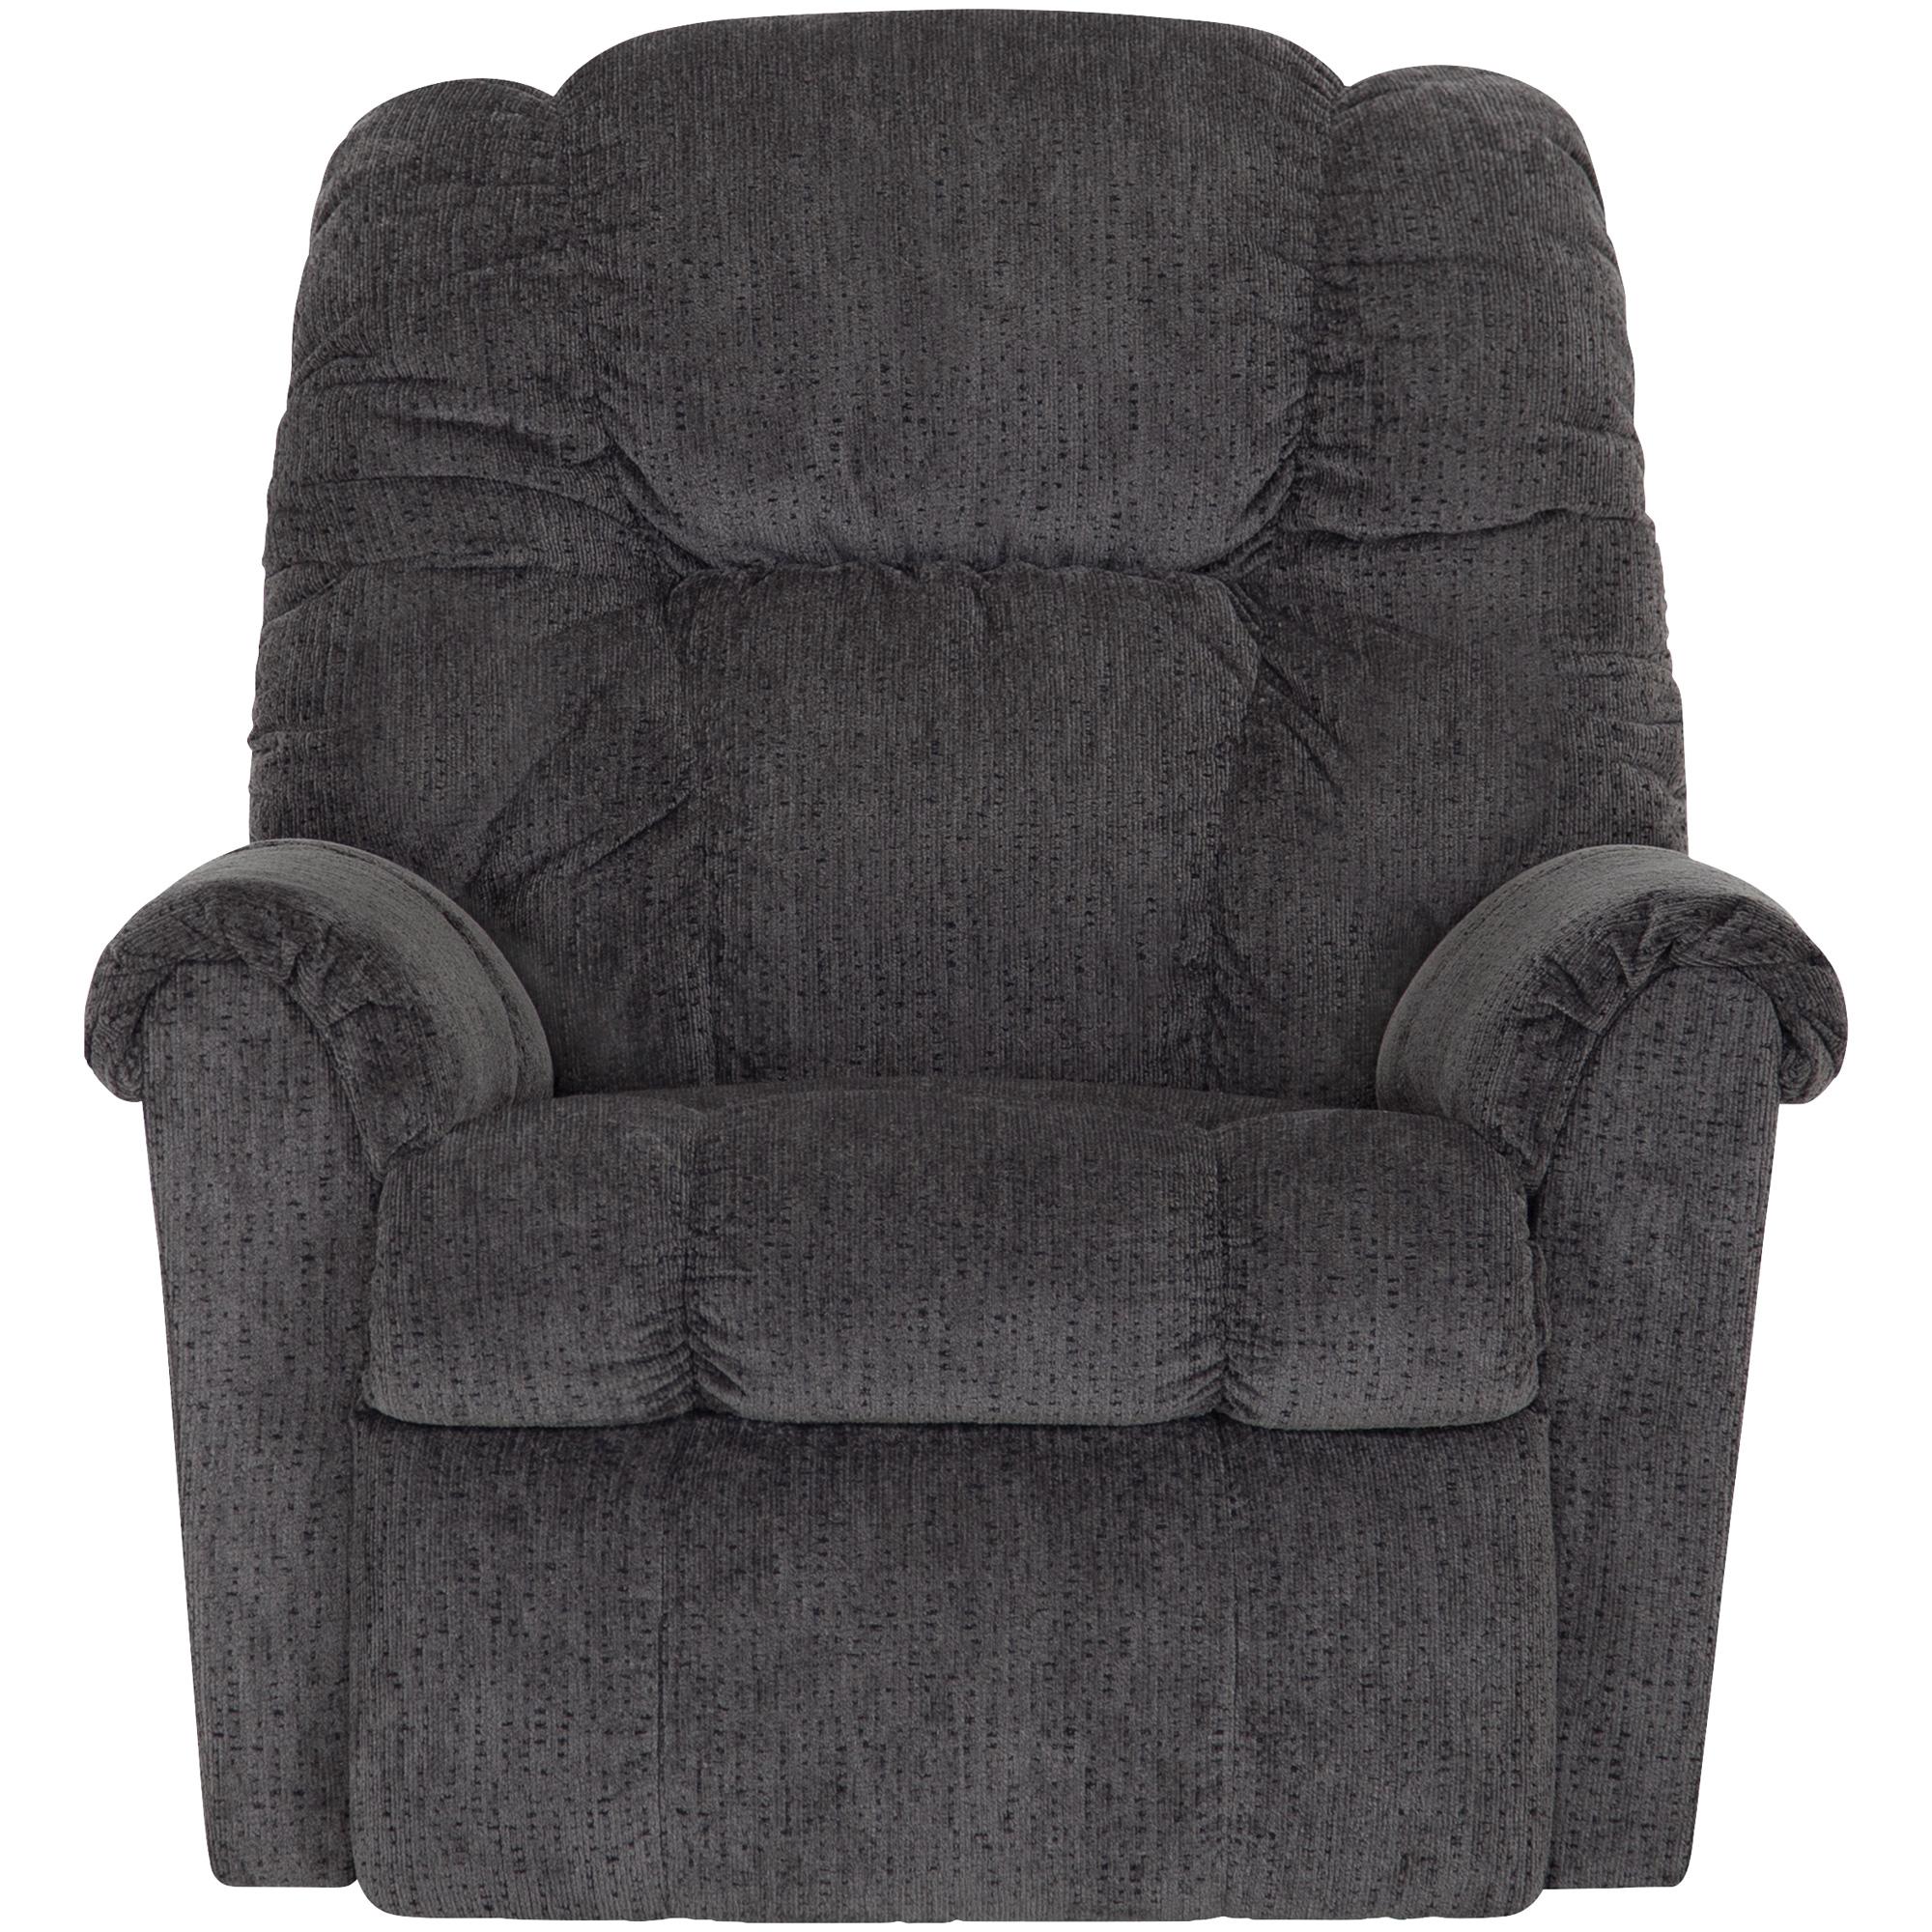 Franklin | Draco Charcoal Rocker Recliner Chair